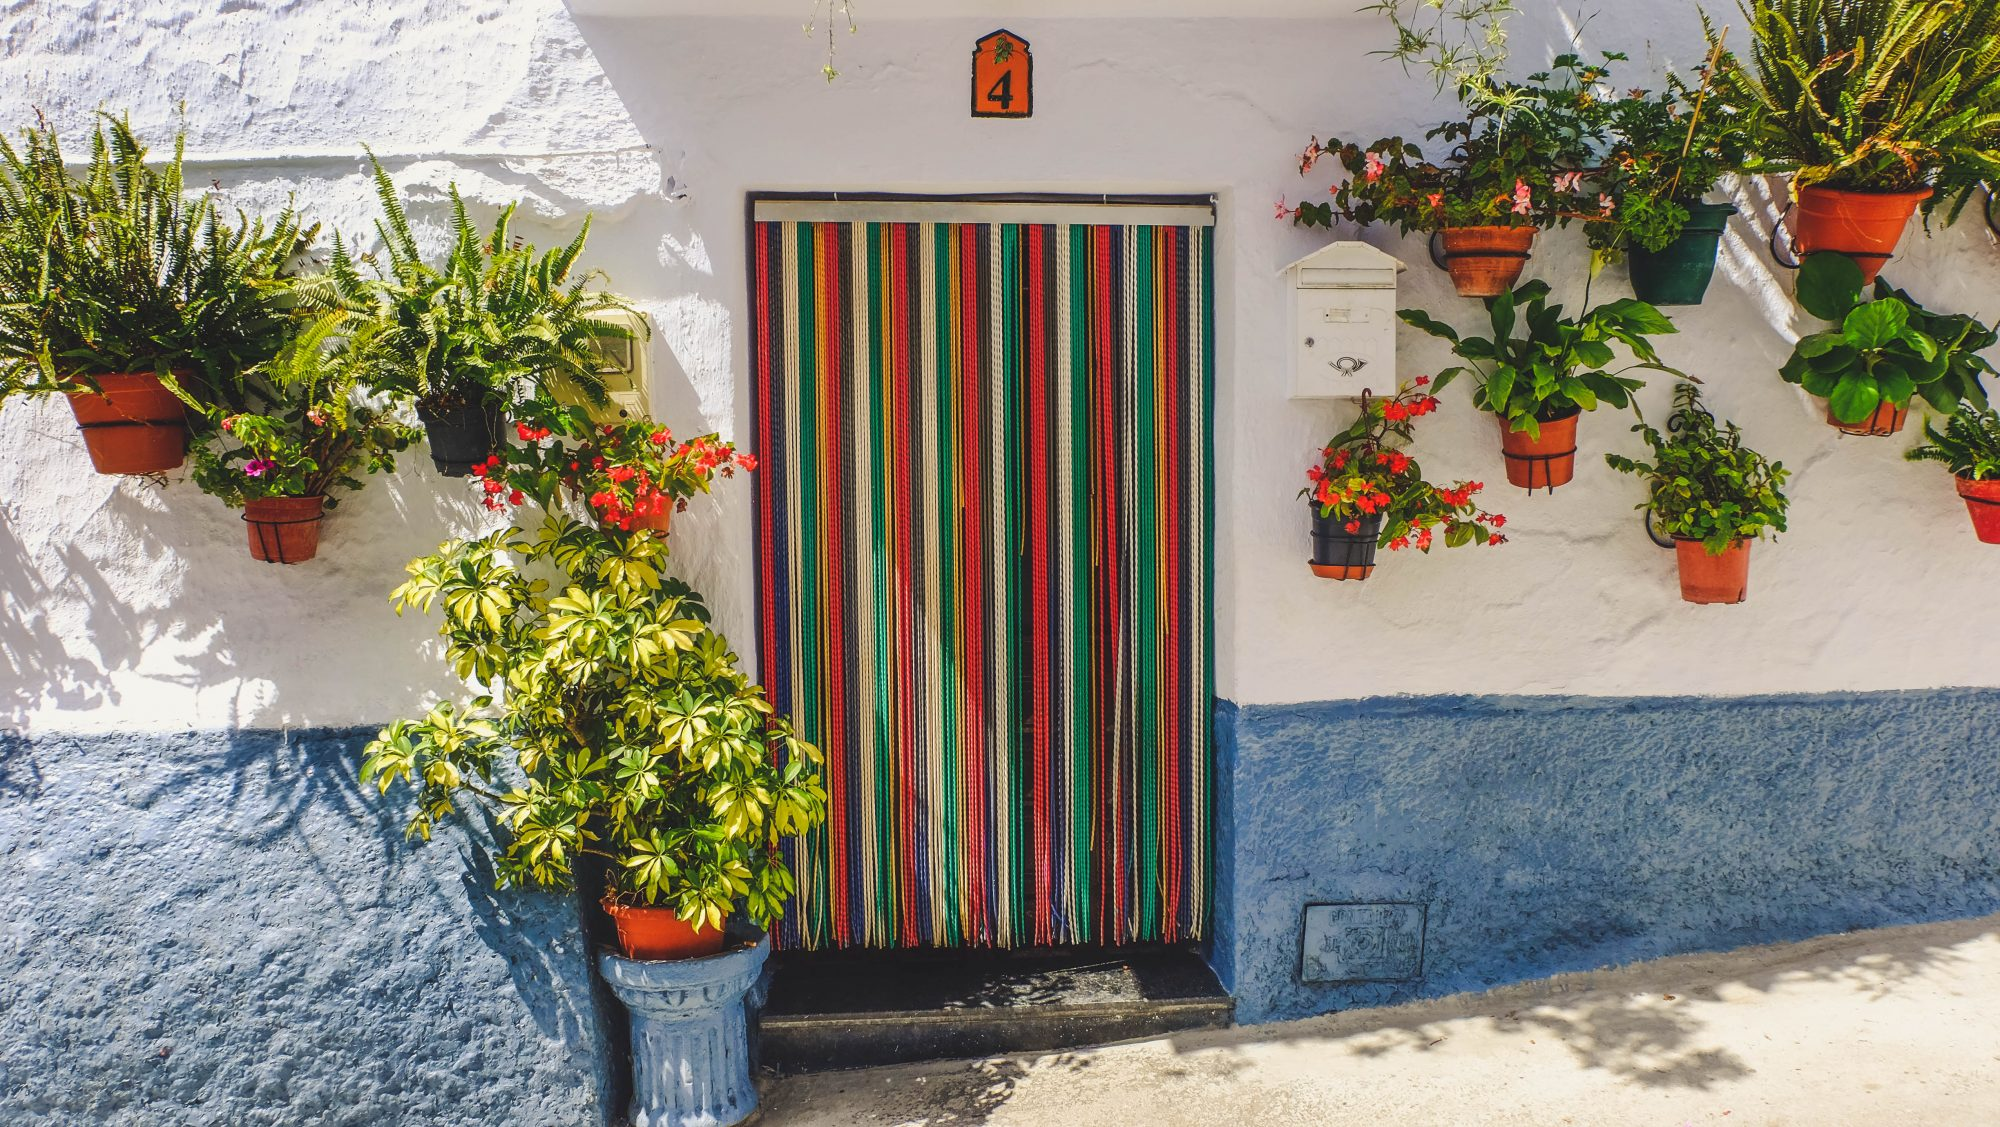 Assortiment de couleurs - Canillas de Aceituno, Espagne